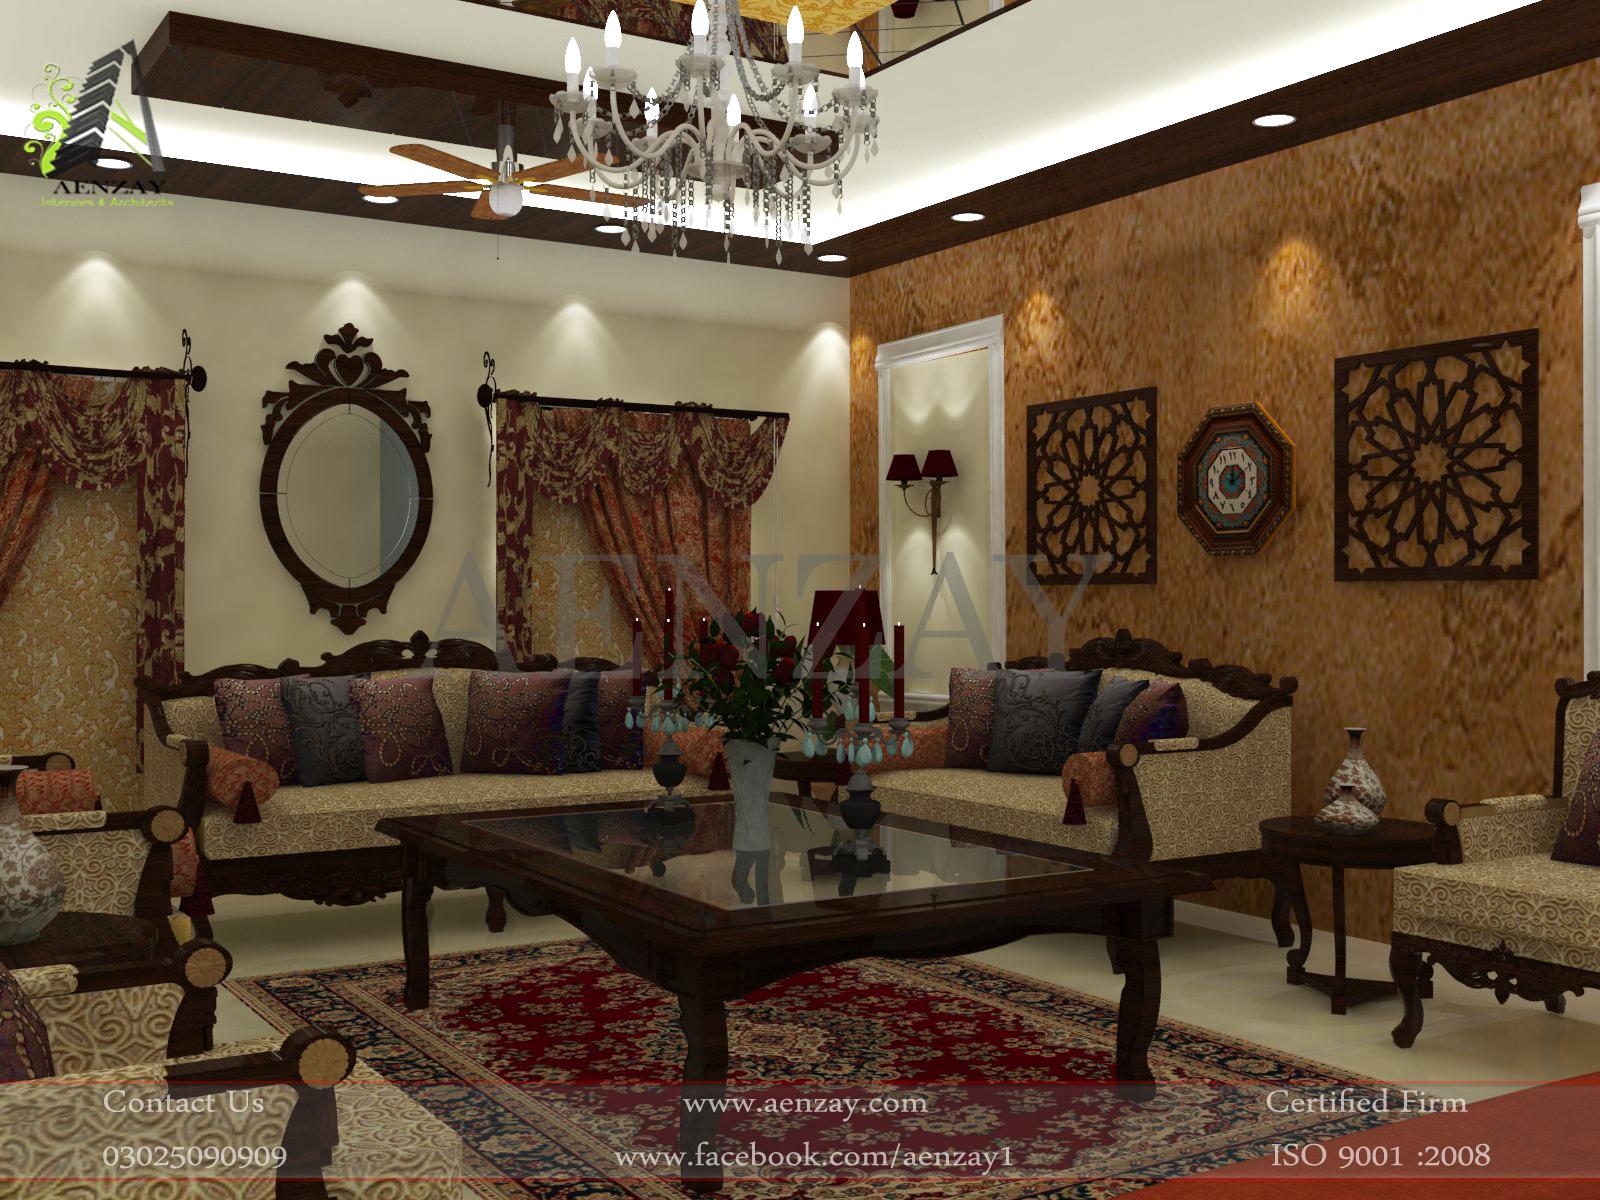 Drawing Room Designed by Aenzay at Multan  Aenzay Interiors  Architecture